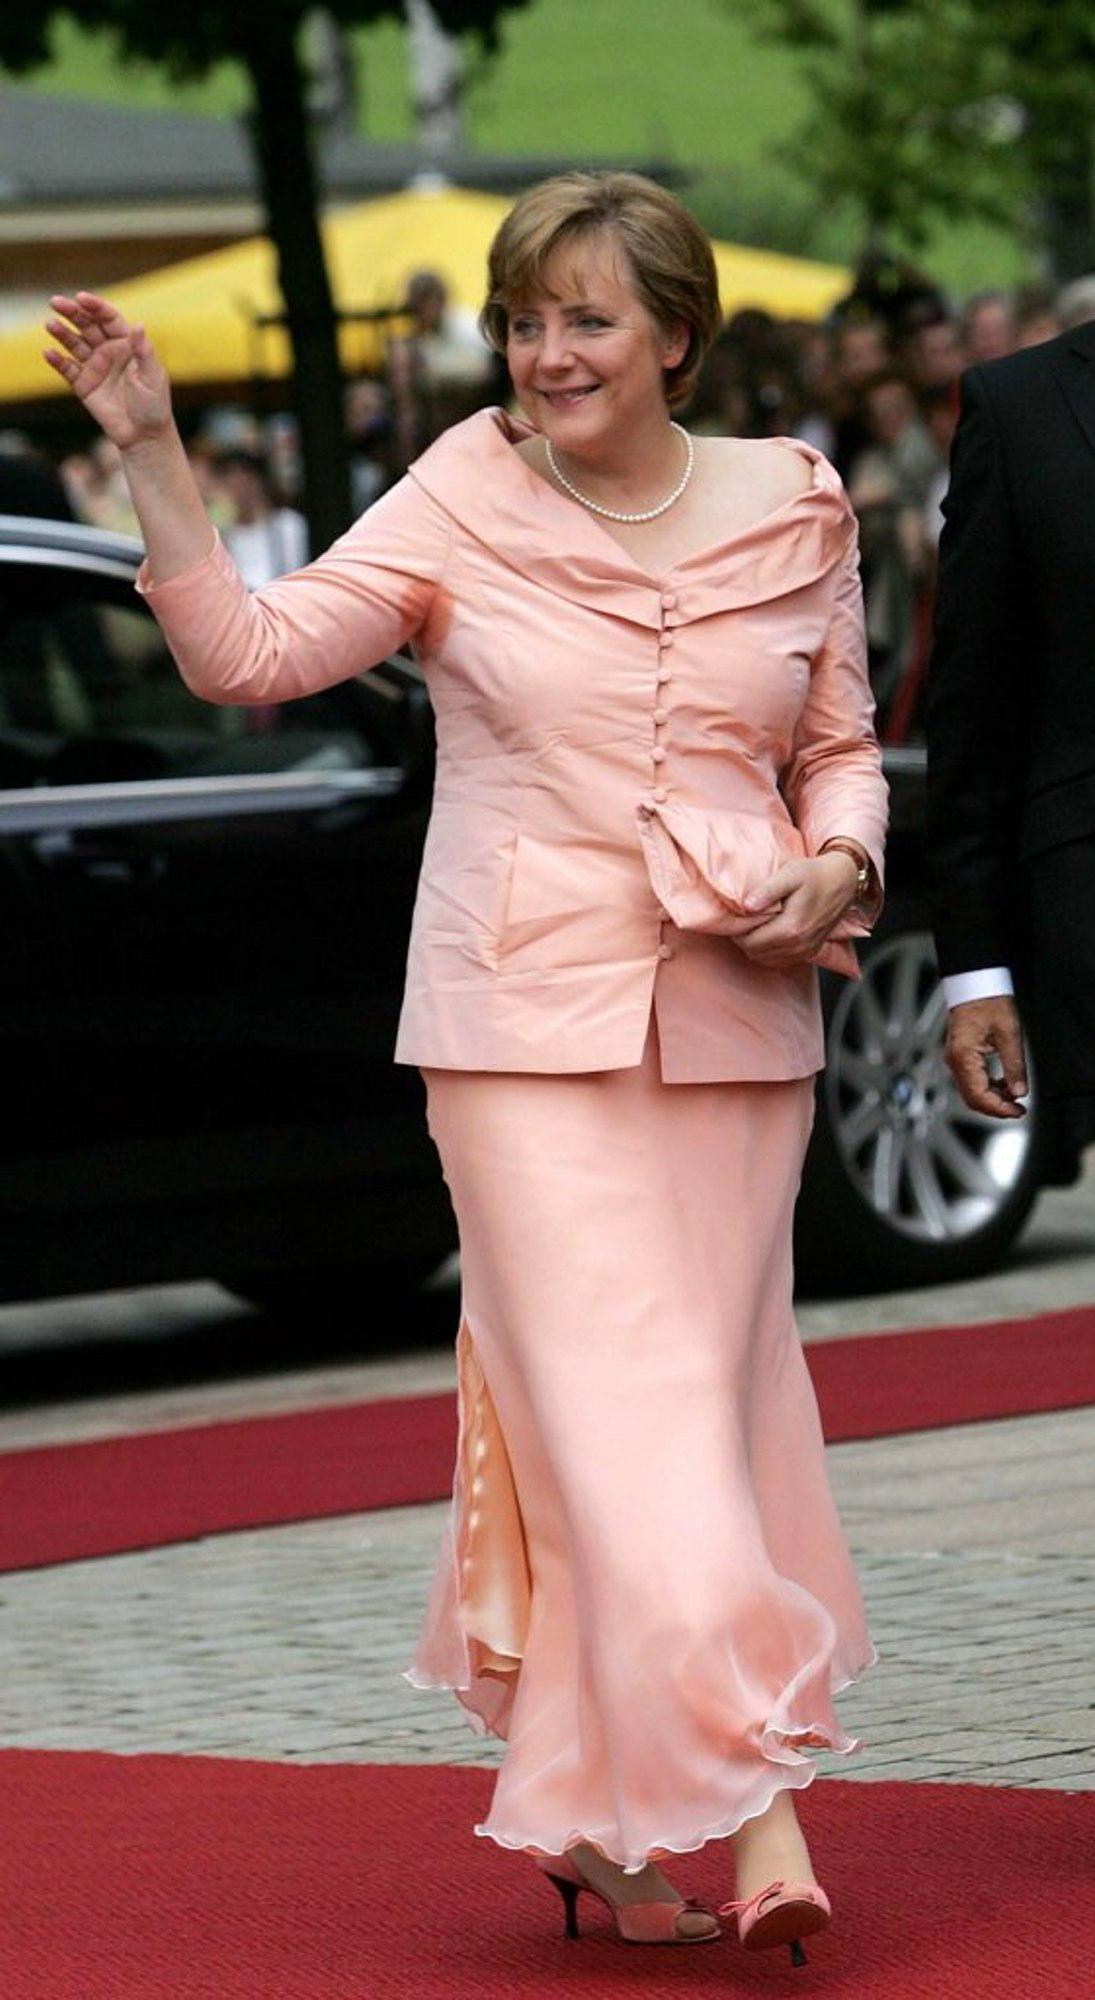 Angela Merkels Feet